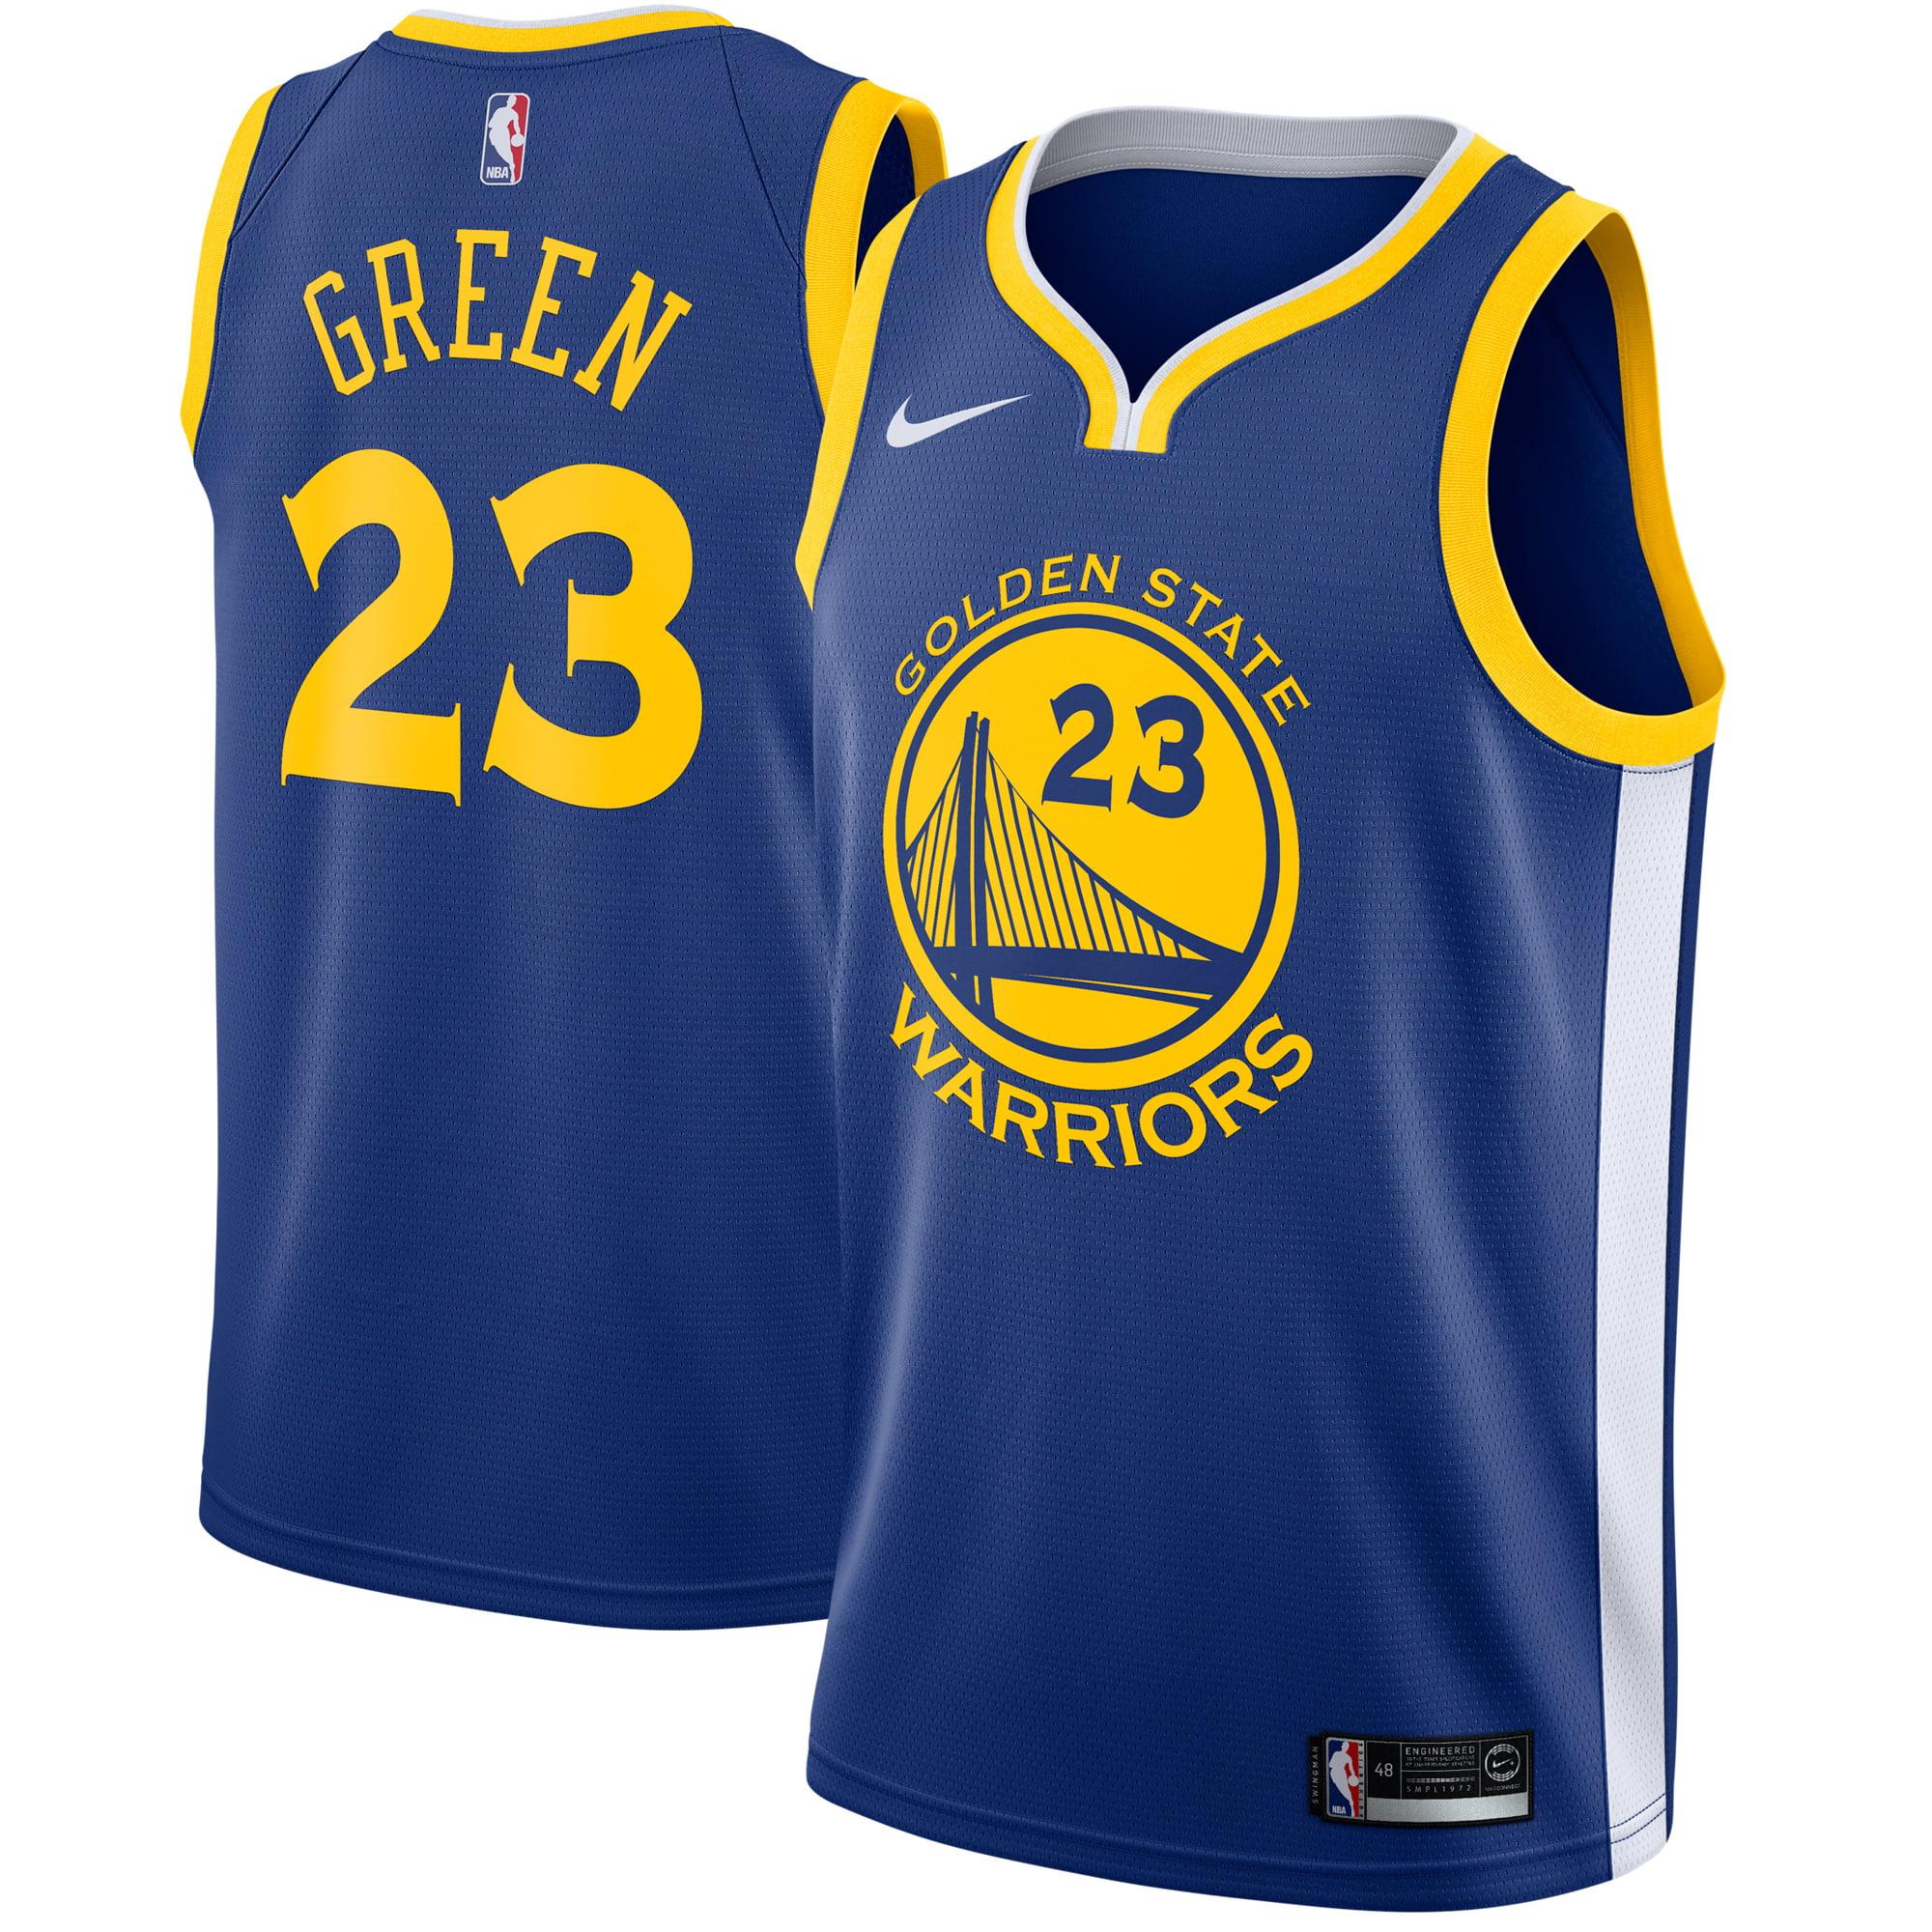 Draymond Green Golden State Warriors Nike Swingman Jersey Blue - Icon Edition